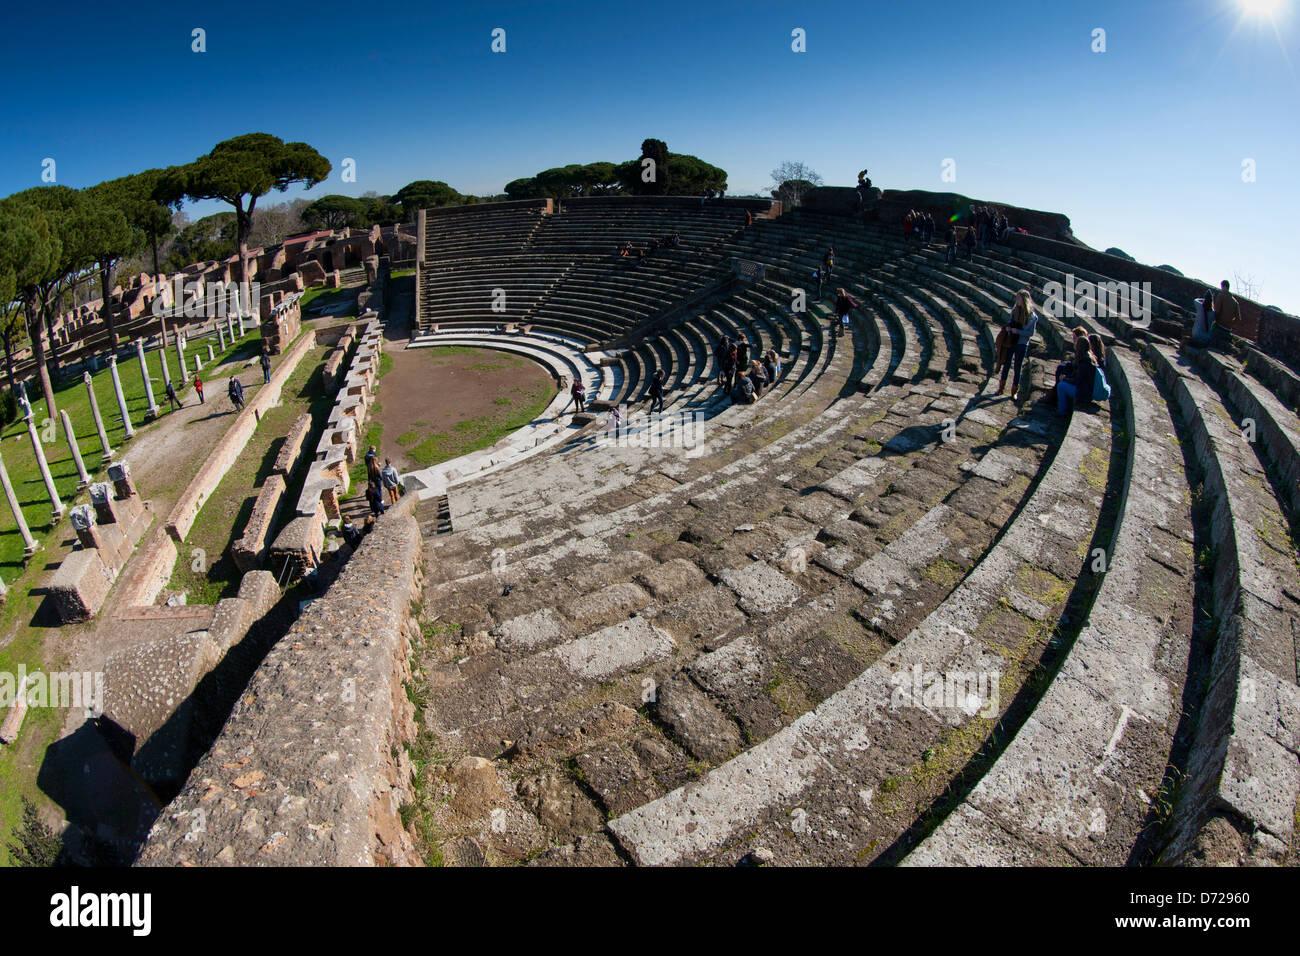 The amphitheatre in Ostia Antica - Stock Image